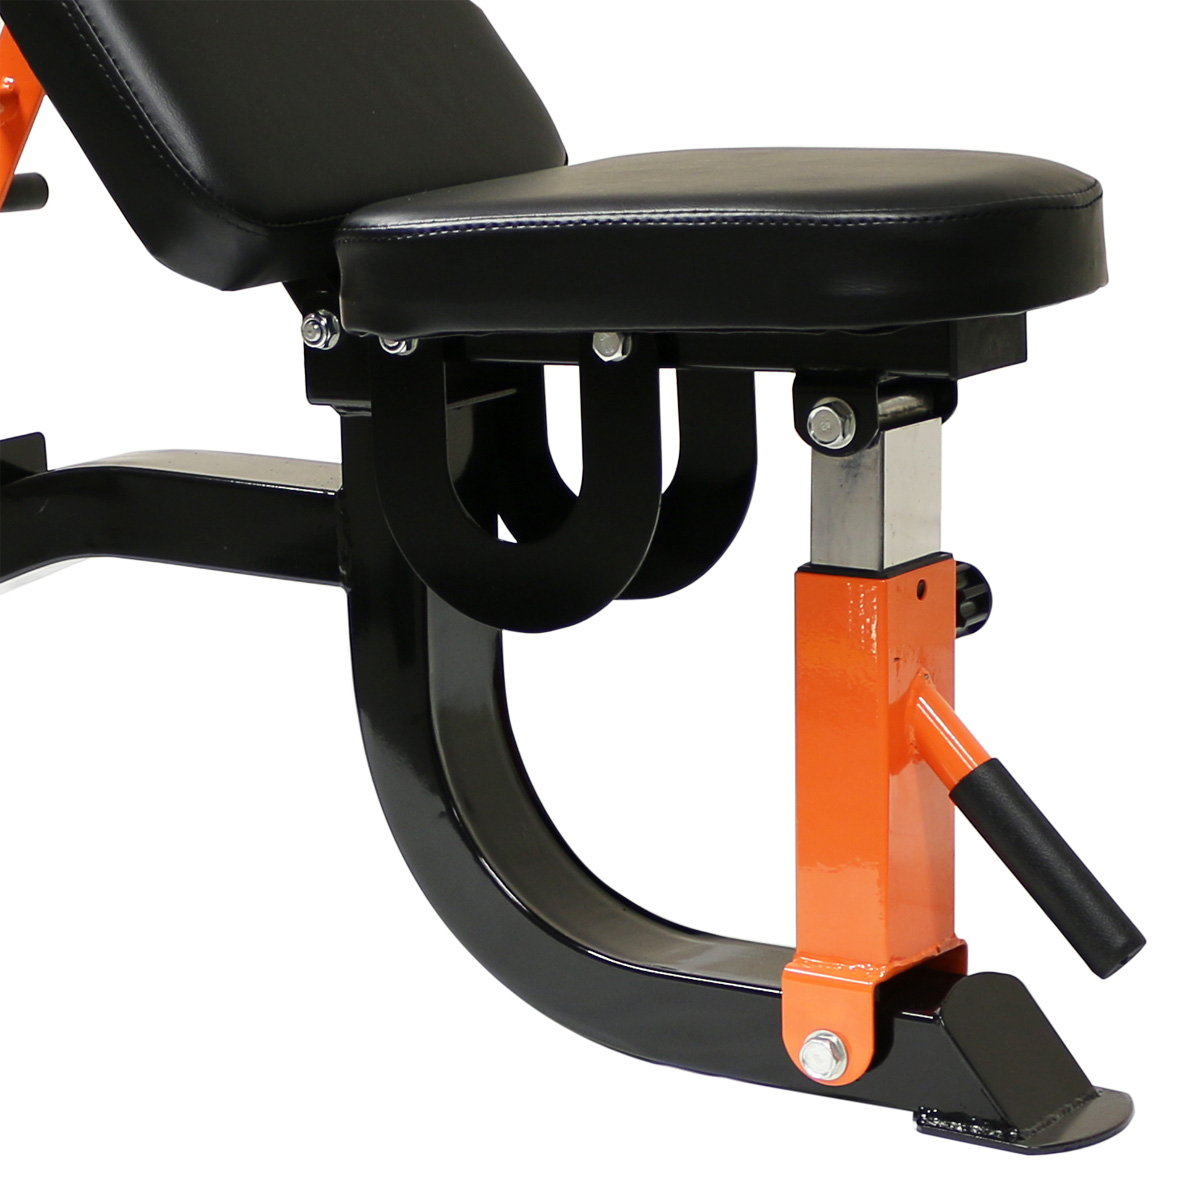 Mirafit Hd Adjustable Fid Weight Bench Amp Squat Rack Dip